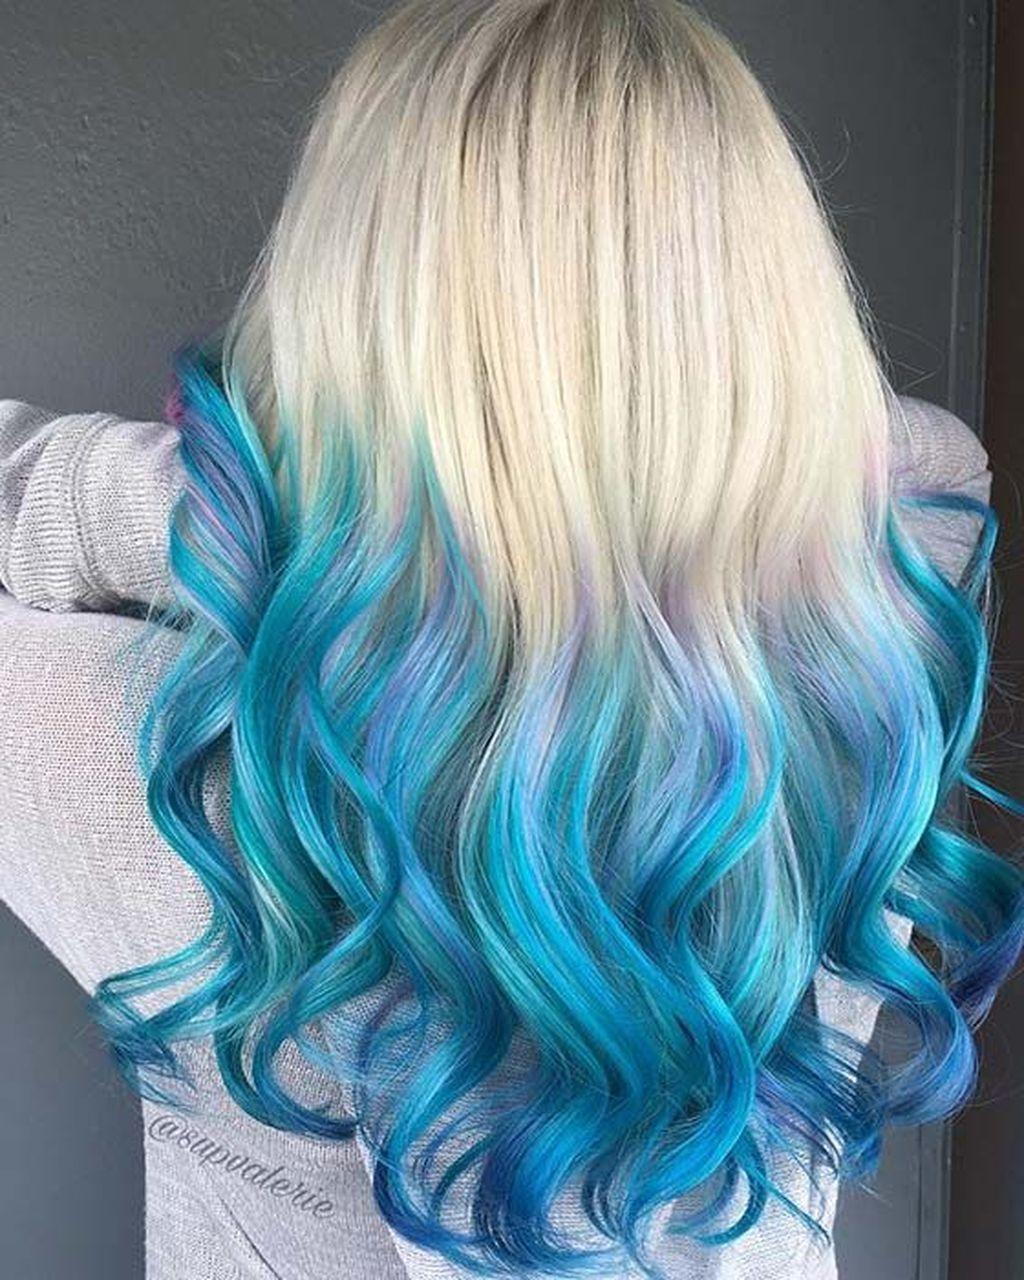 46 Wonderful Ombre Hair Color Ideas Blue Ombre Hair Ombre Hair